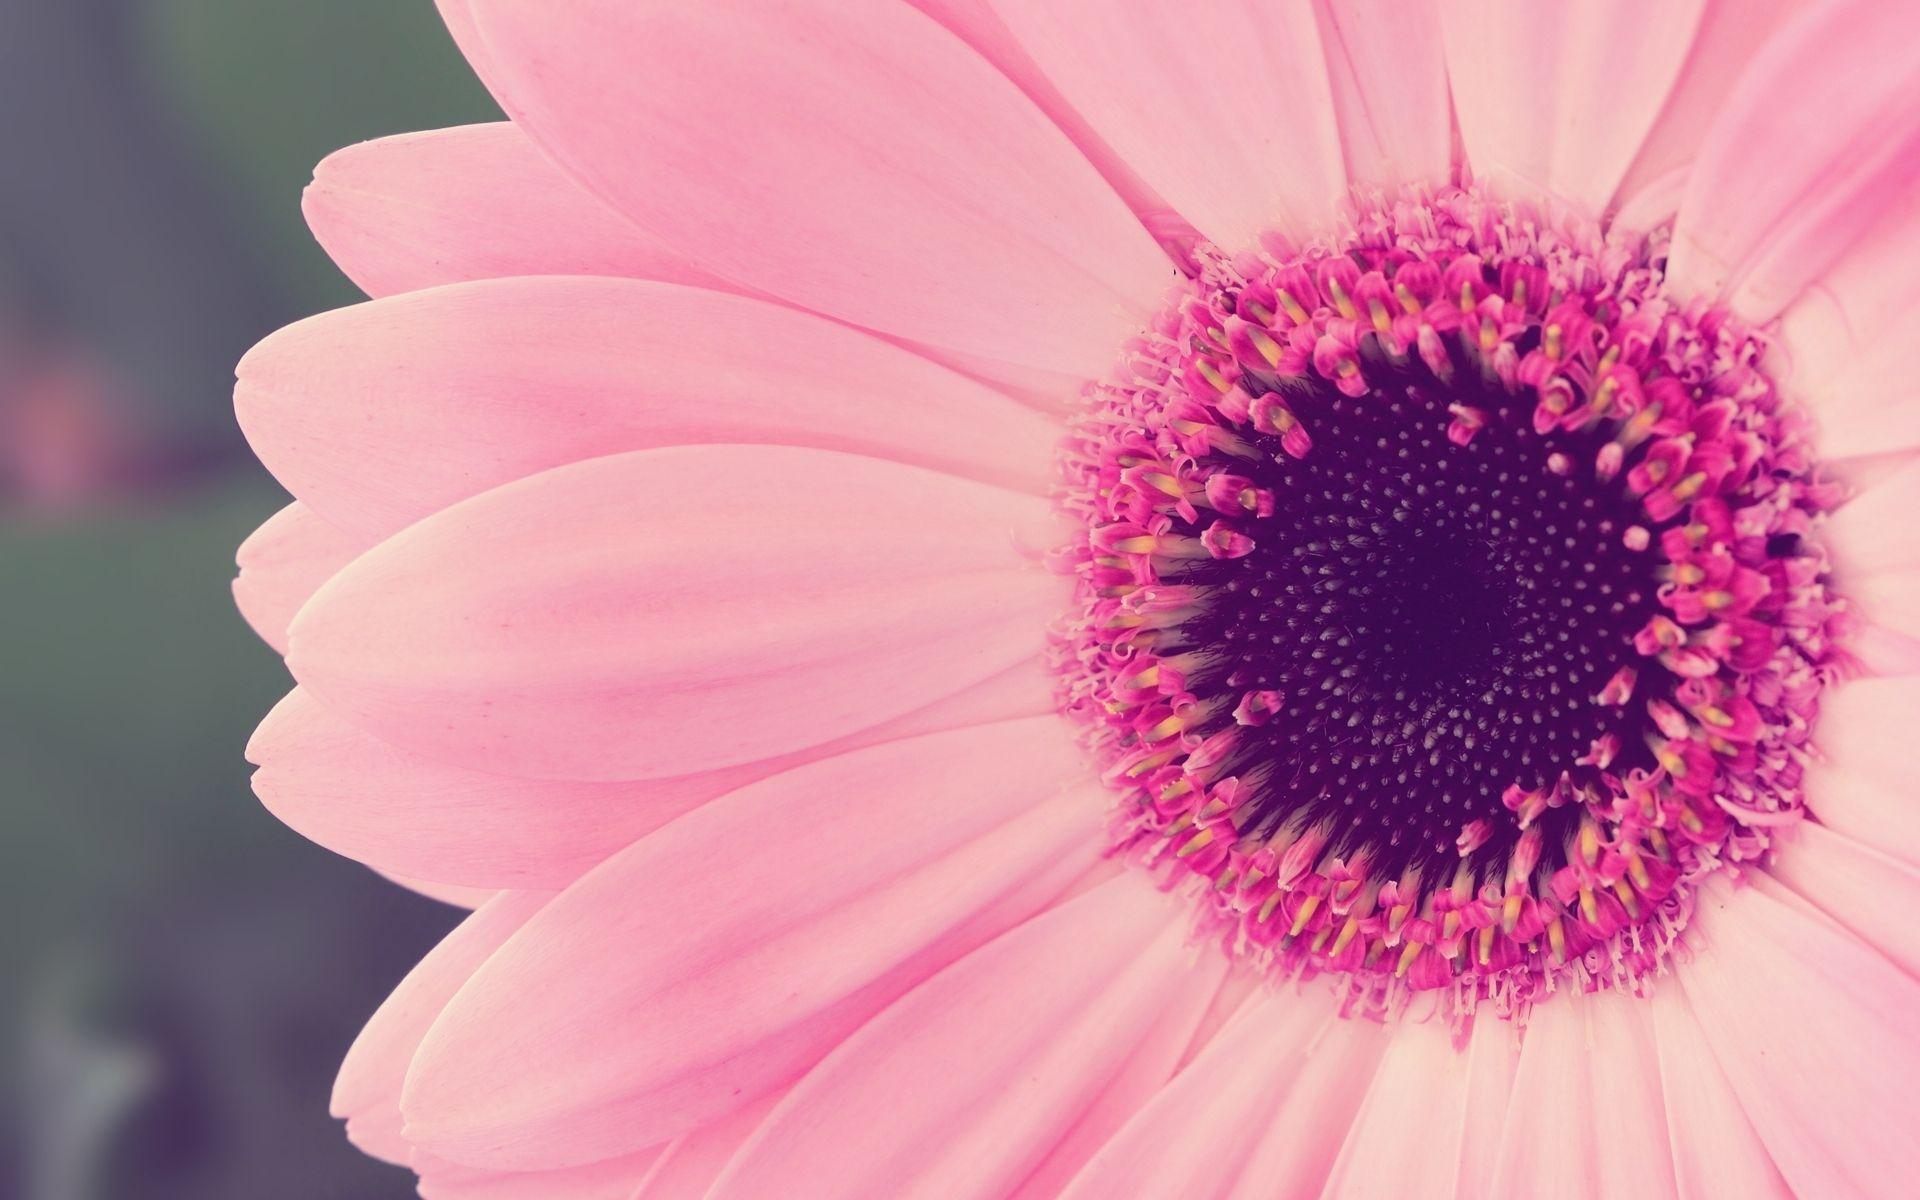 Wallpaper For Desktop Pink